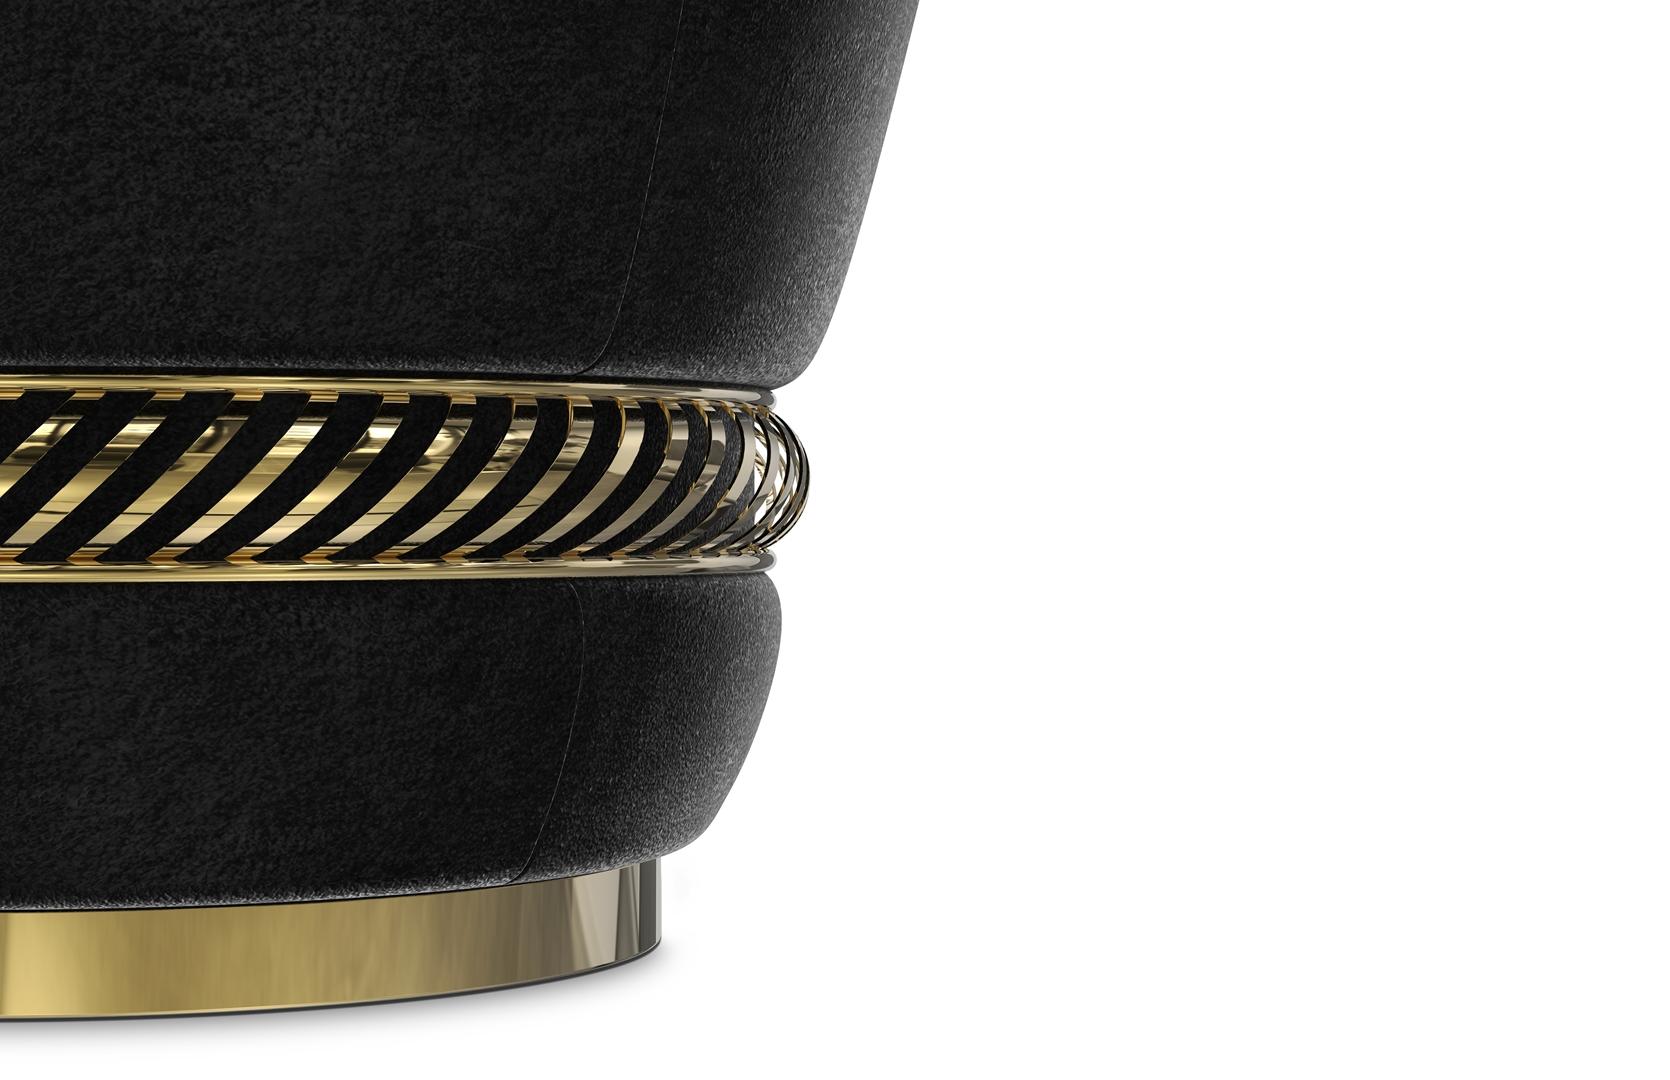 noir-stool-02 (Copy)